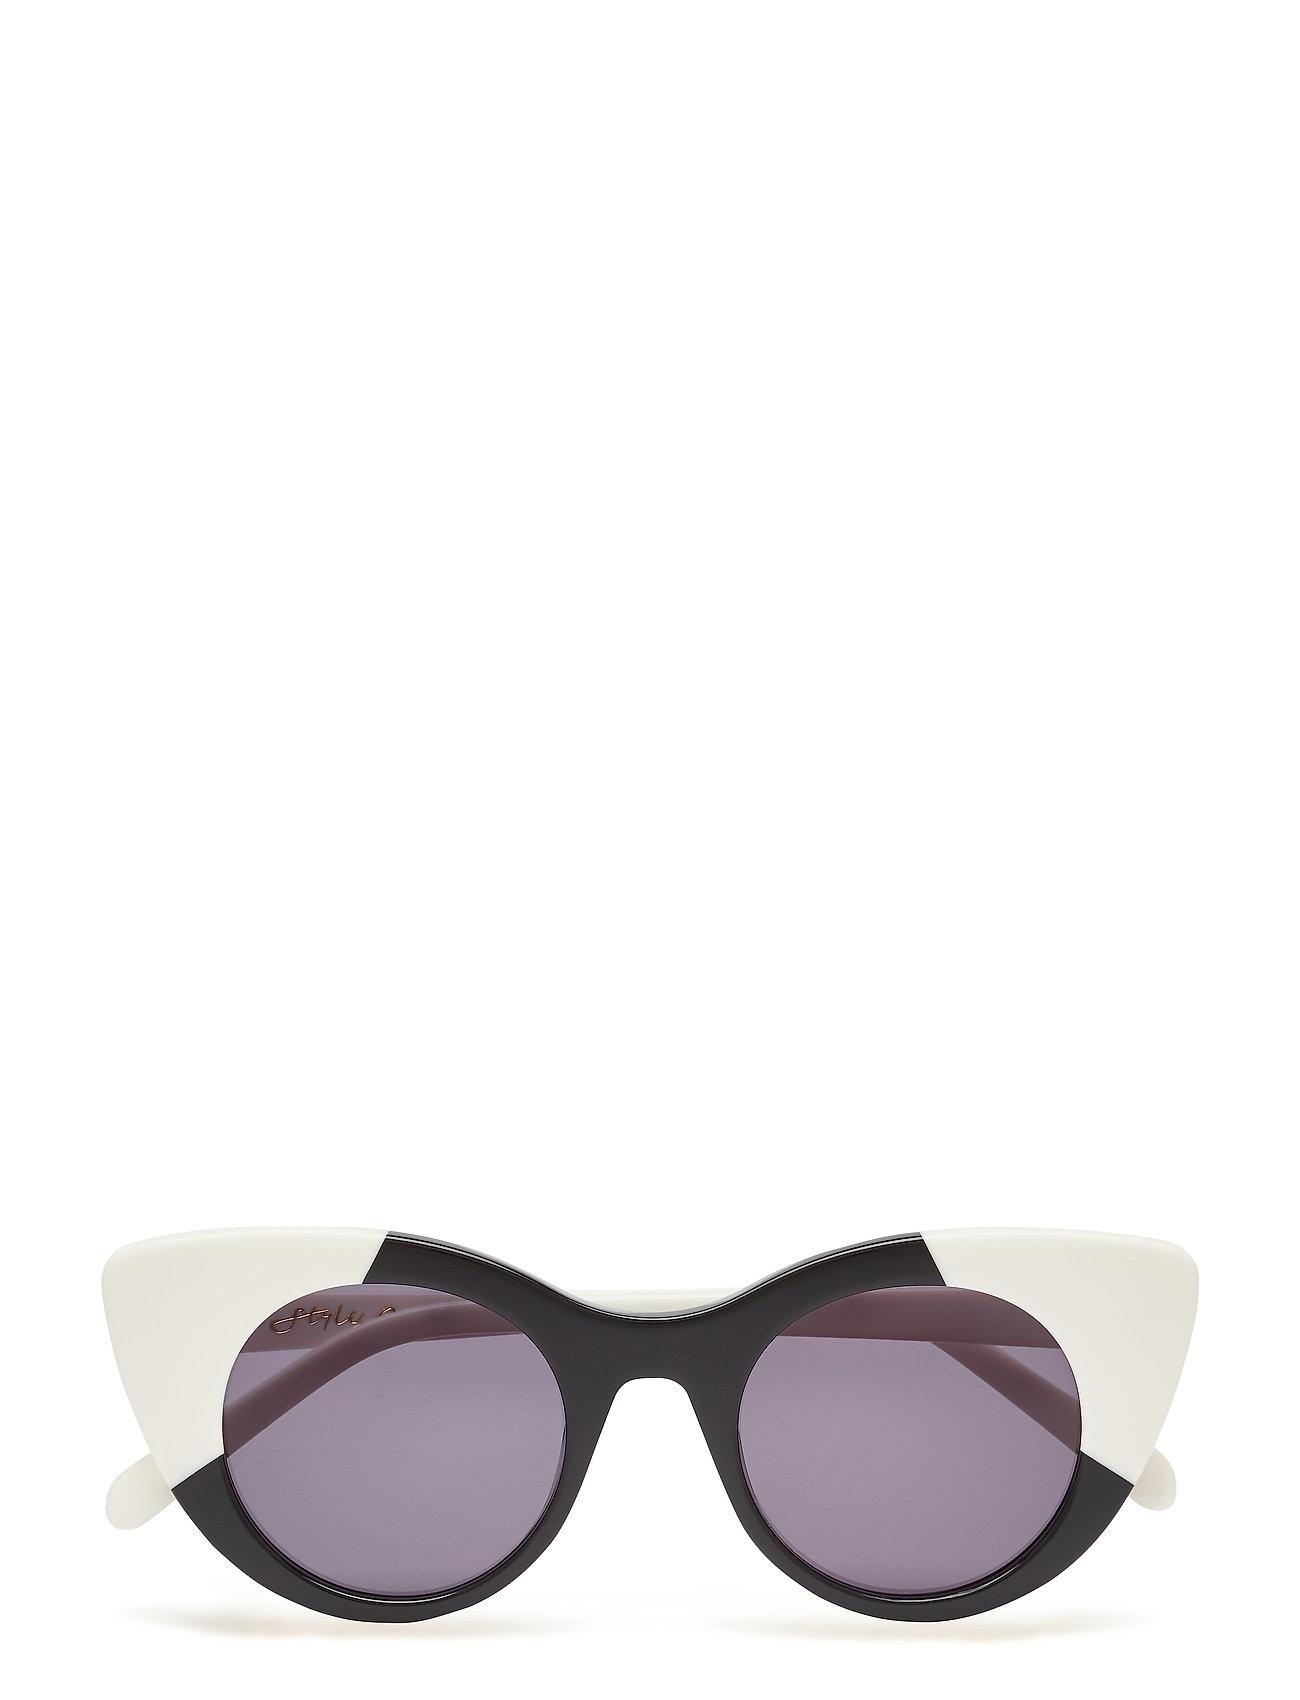 Elle Style Awards Collection 2019 ELLE Sunglasses - BLACK